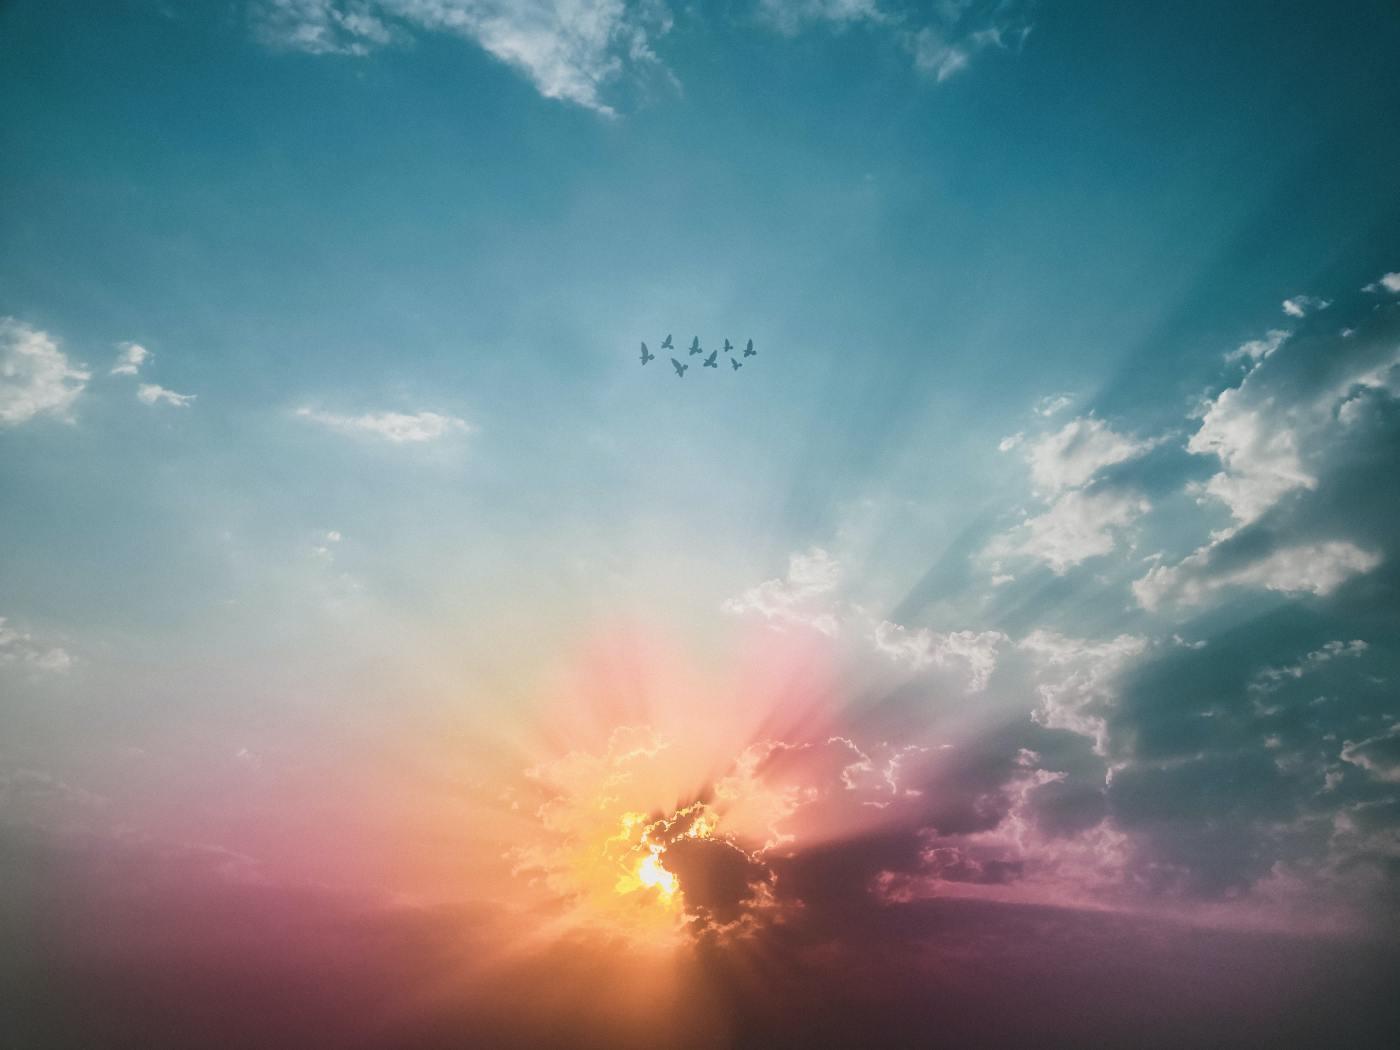 Birds flying high in an orange sunrise